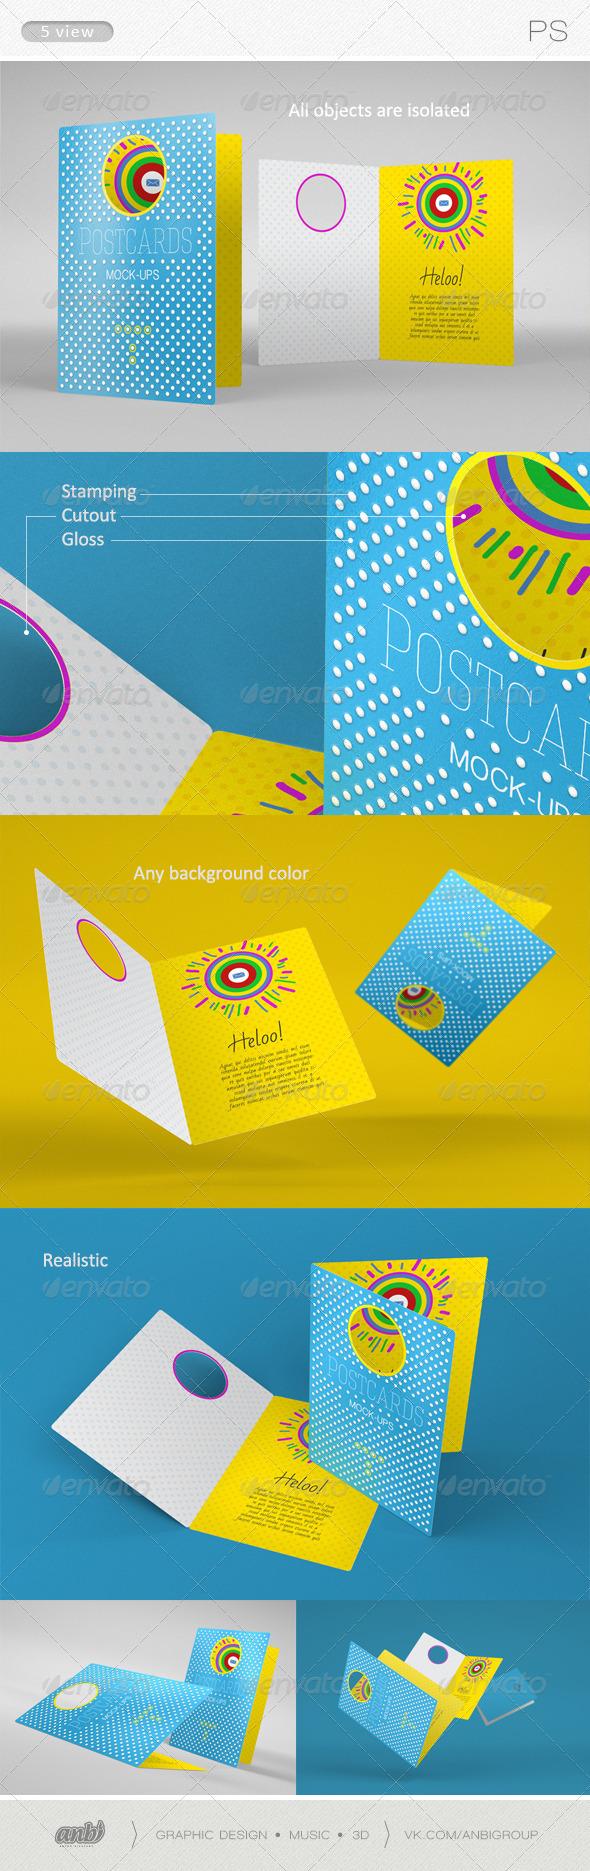 Postcards Mock-ups 2 - Product Mock-Ups Graphics